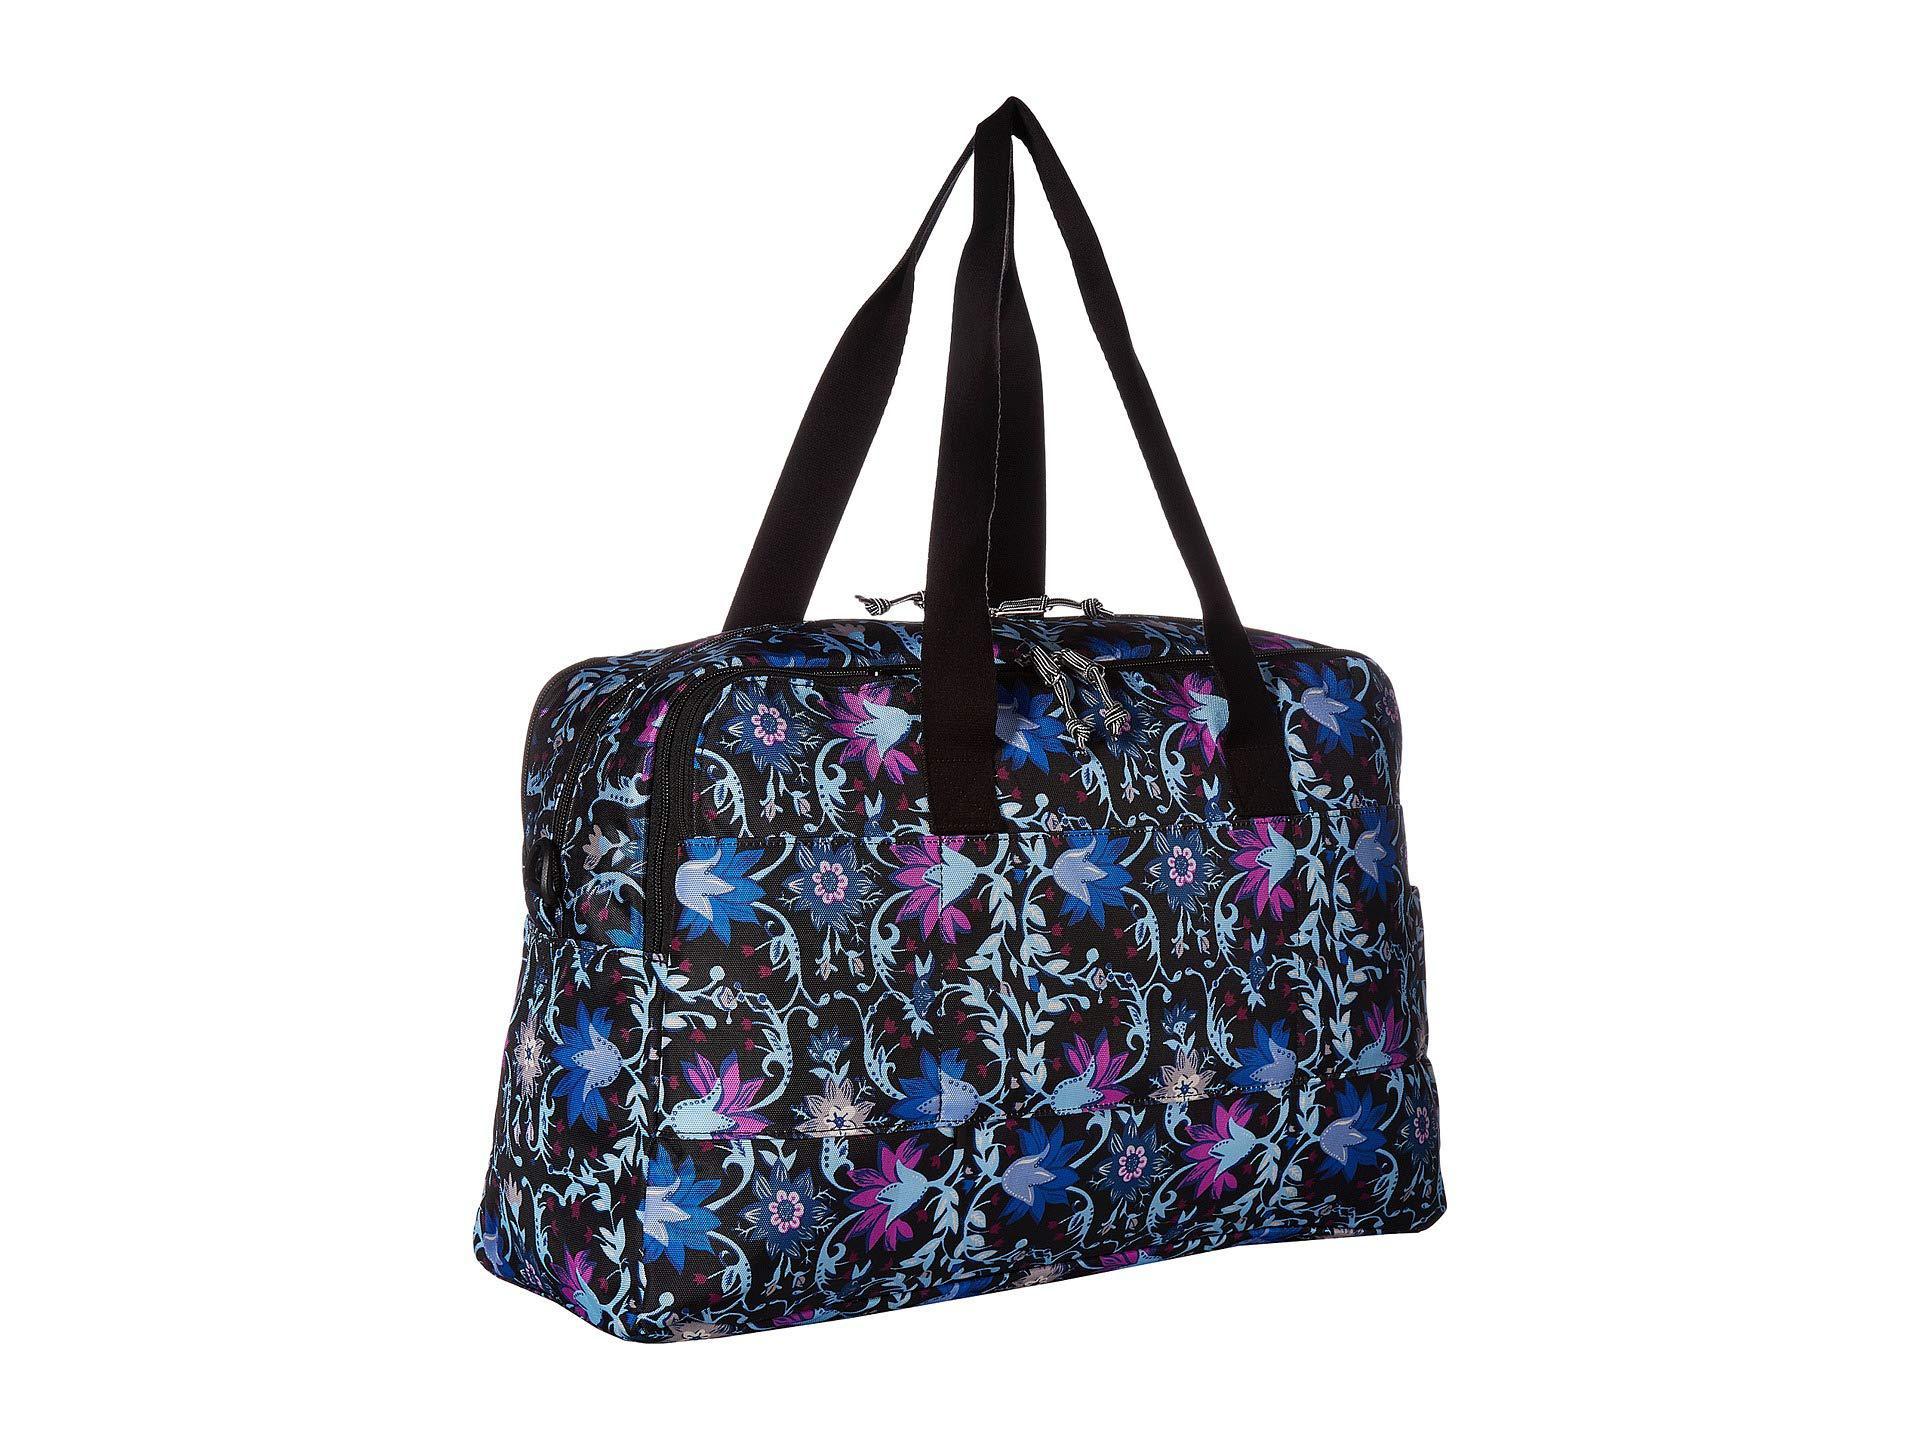 c18a1ce616 Vera Bradley - Multicolor Lighten Up Weekender Travel Bag (petite Vines)  Bags - Lyst. View fullscreen